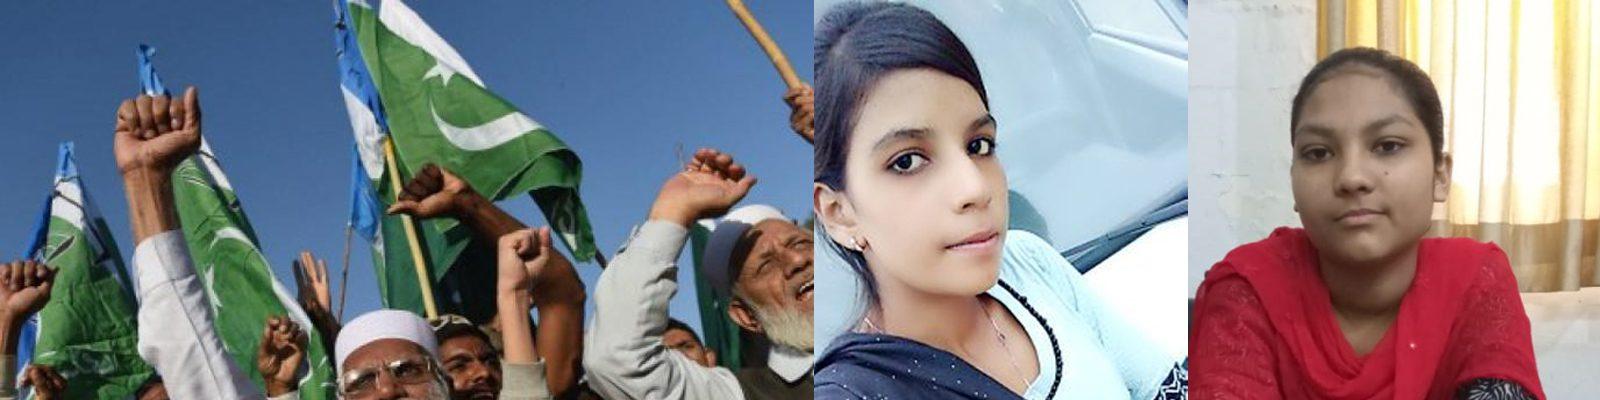 Pakistan-gekidnapte-meisjes